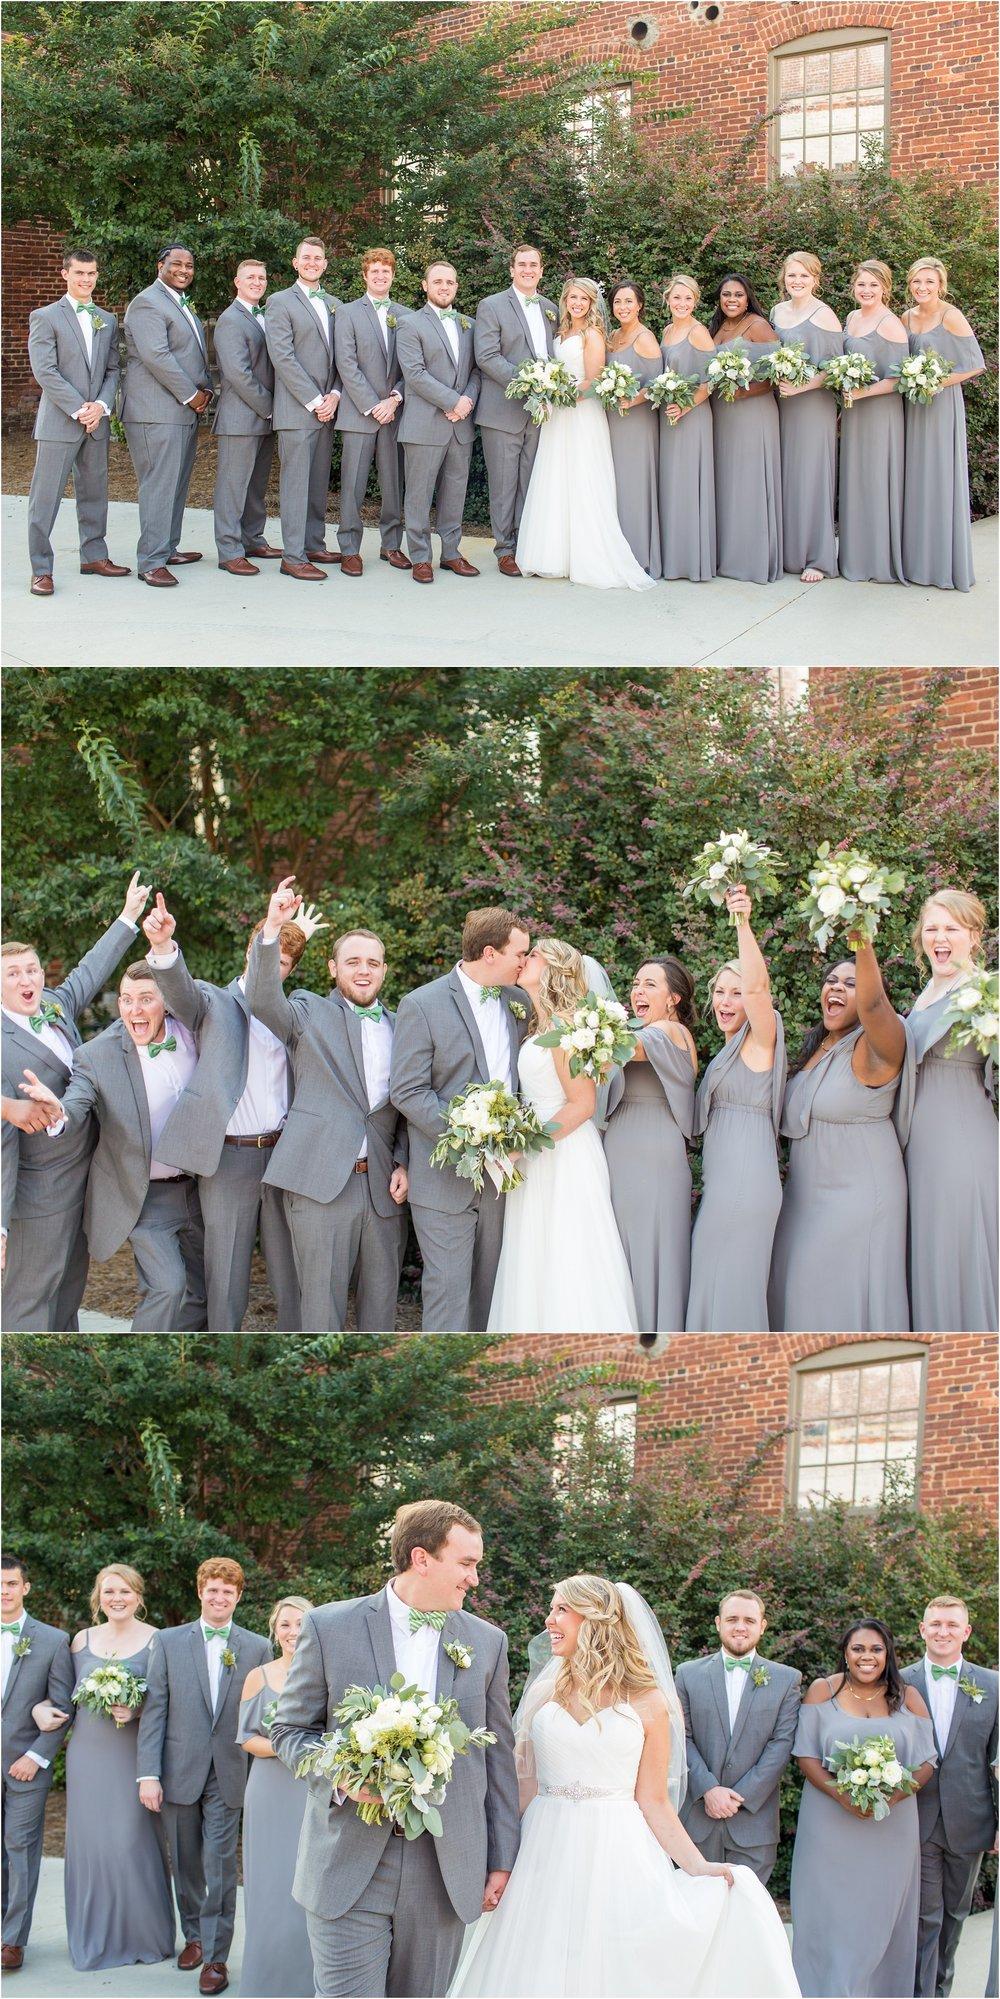 Savannah Eve Photography- Gunter Wedding- Blog-48.jpg